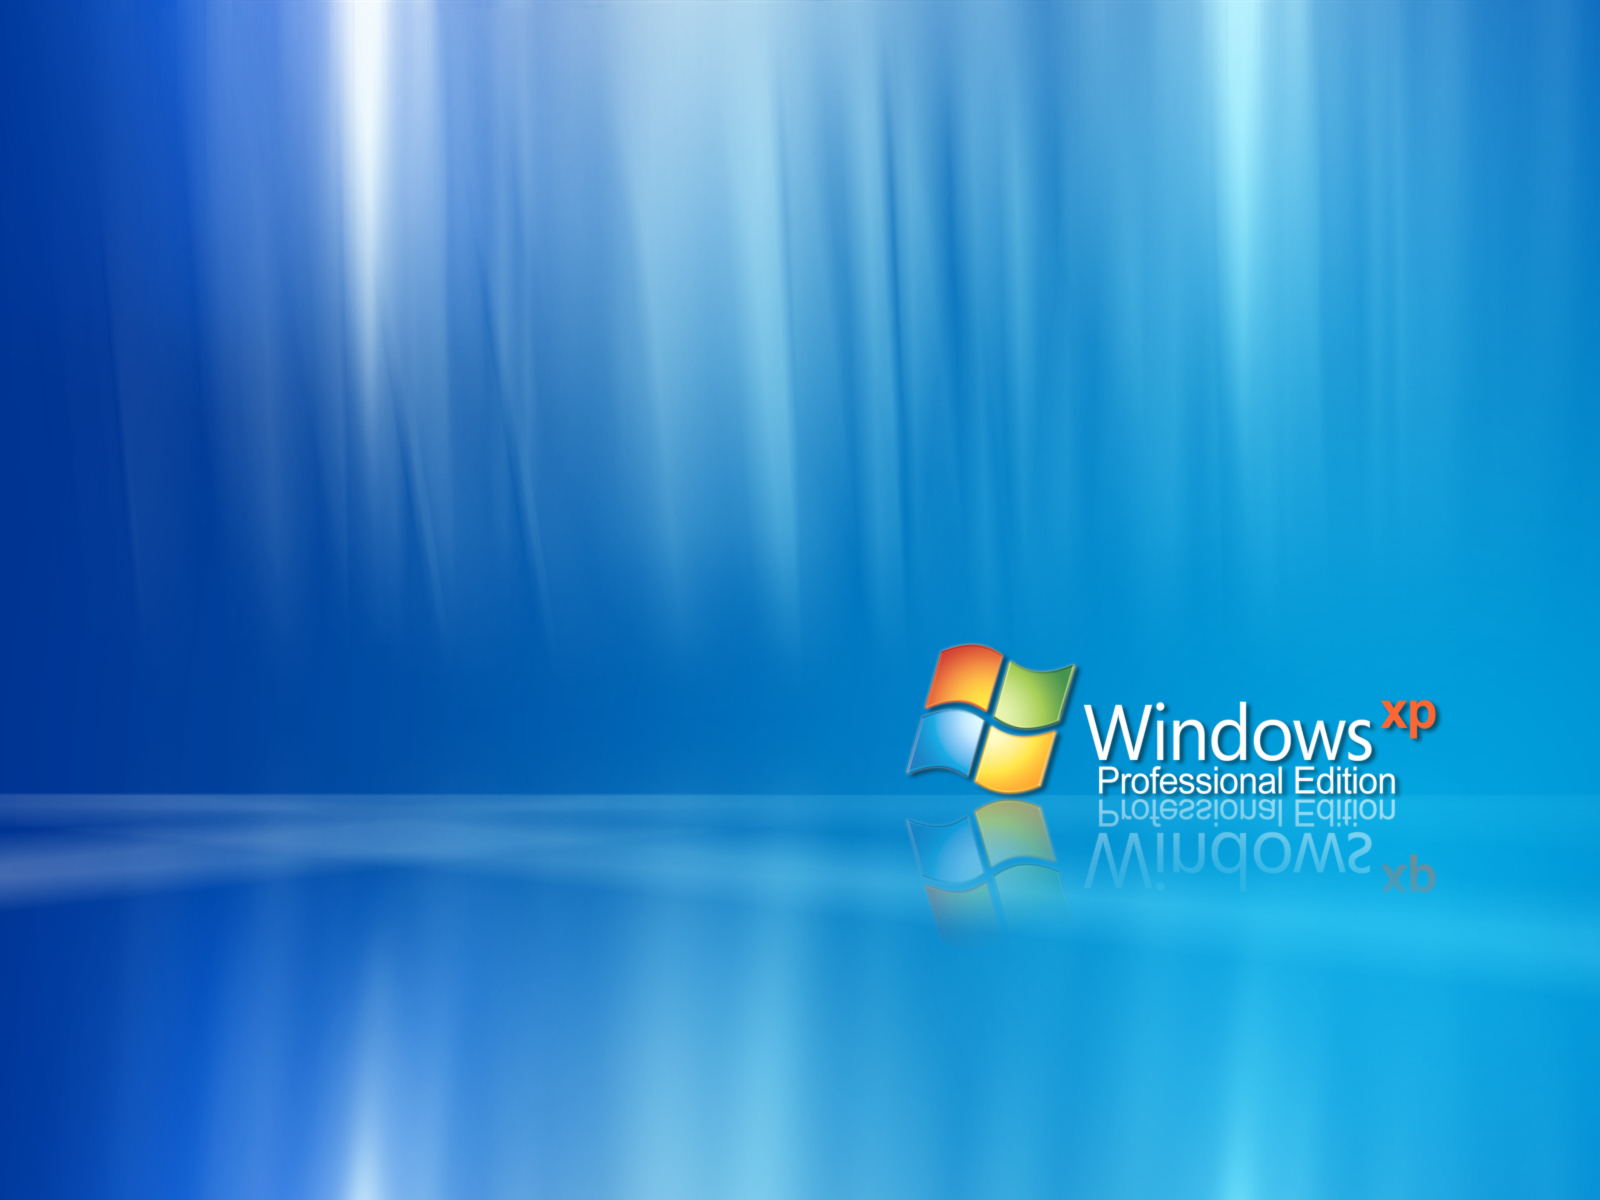 http://4.bp.blogspot.com/-Yon91-og2Zo/T8YUFlxyGwI/AAAAAAAABzI/Zzi7O04LVgY/s1600/windows%2Bxp%2Bhd%2Bwallpaper%2B2.jpg